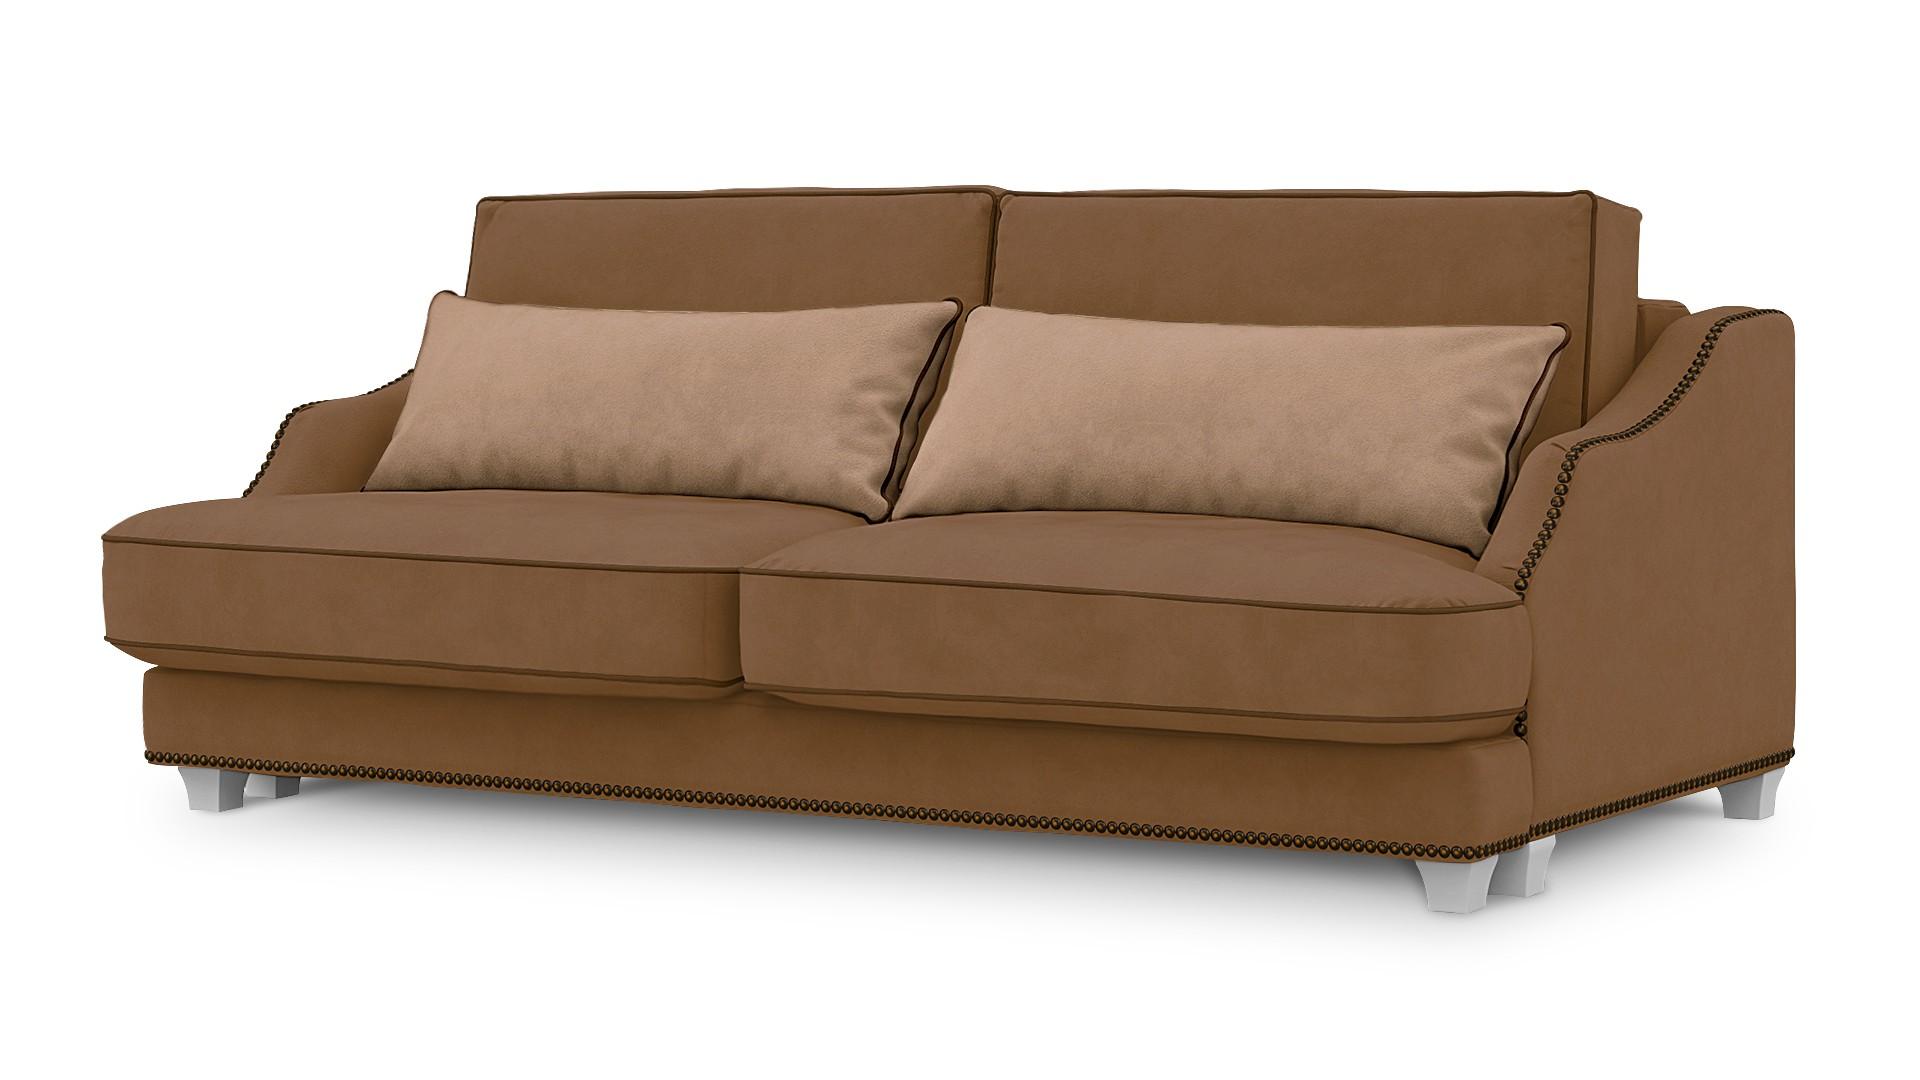 Fiesta диван будапешт коричневый 133769/7